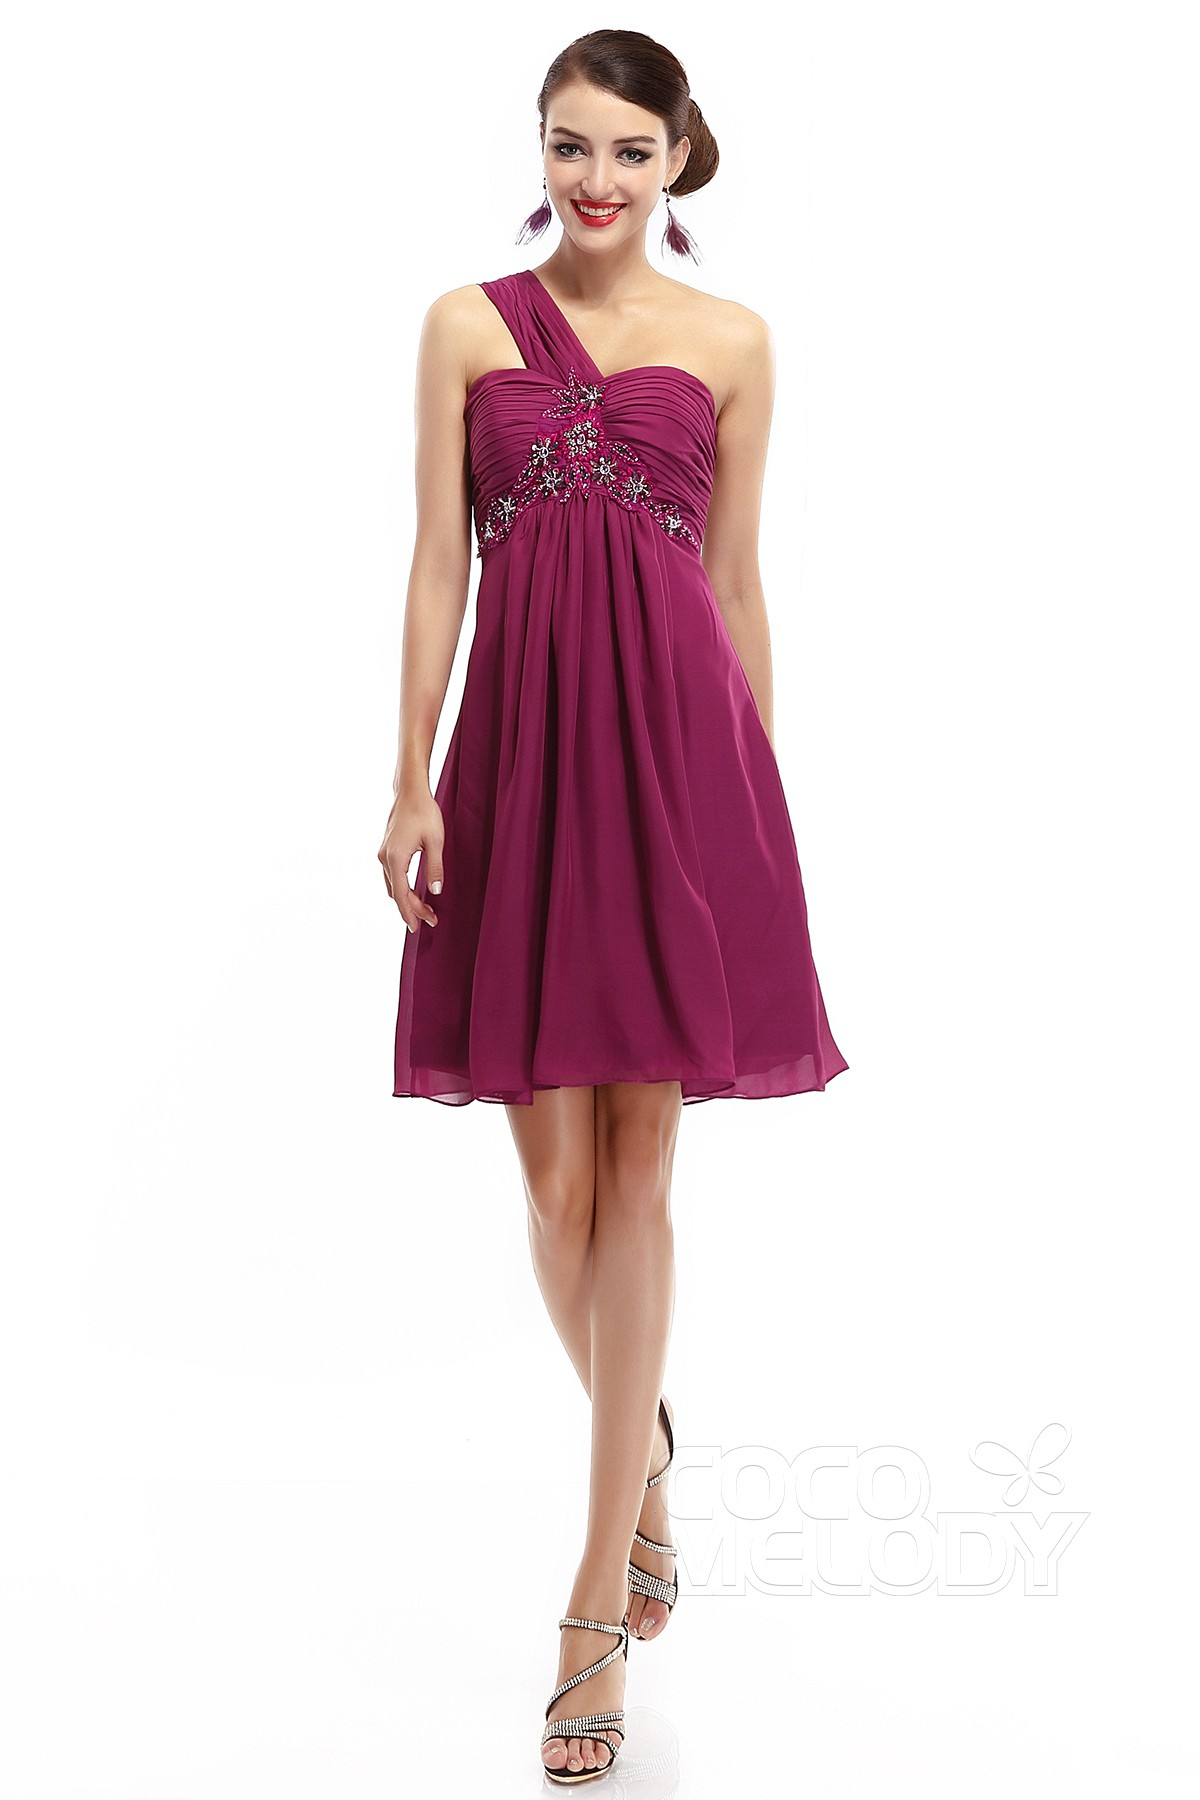 Chiffon Party Dresses